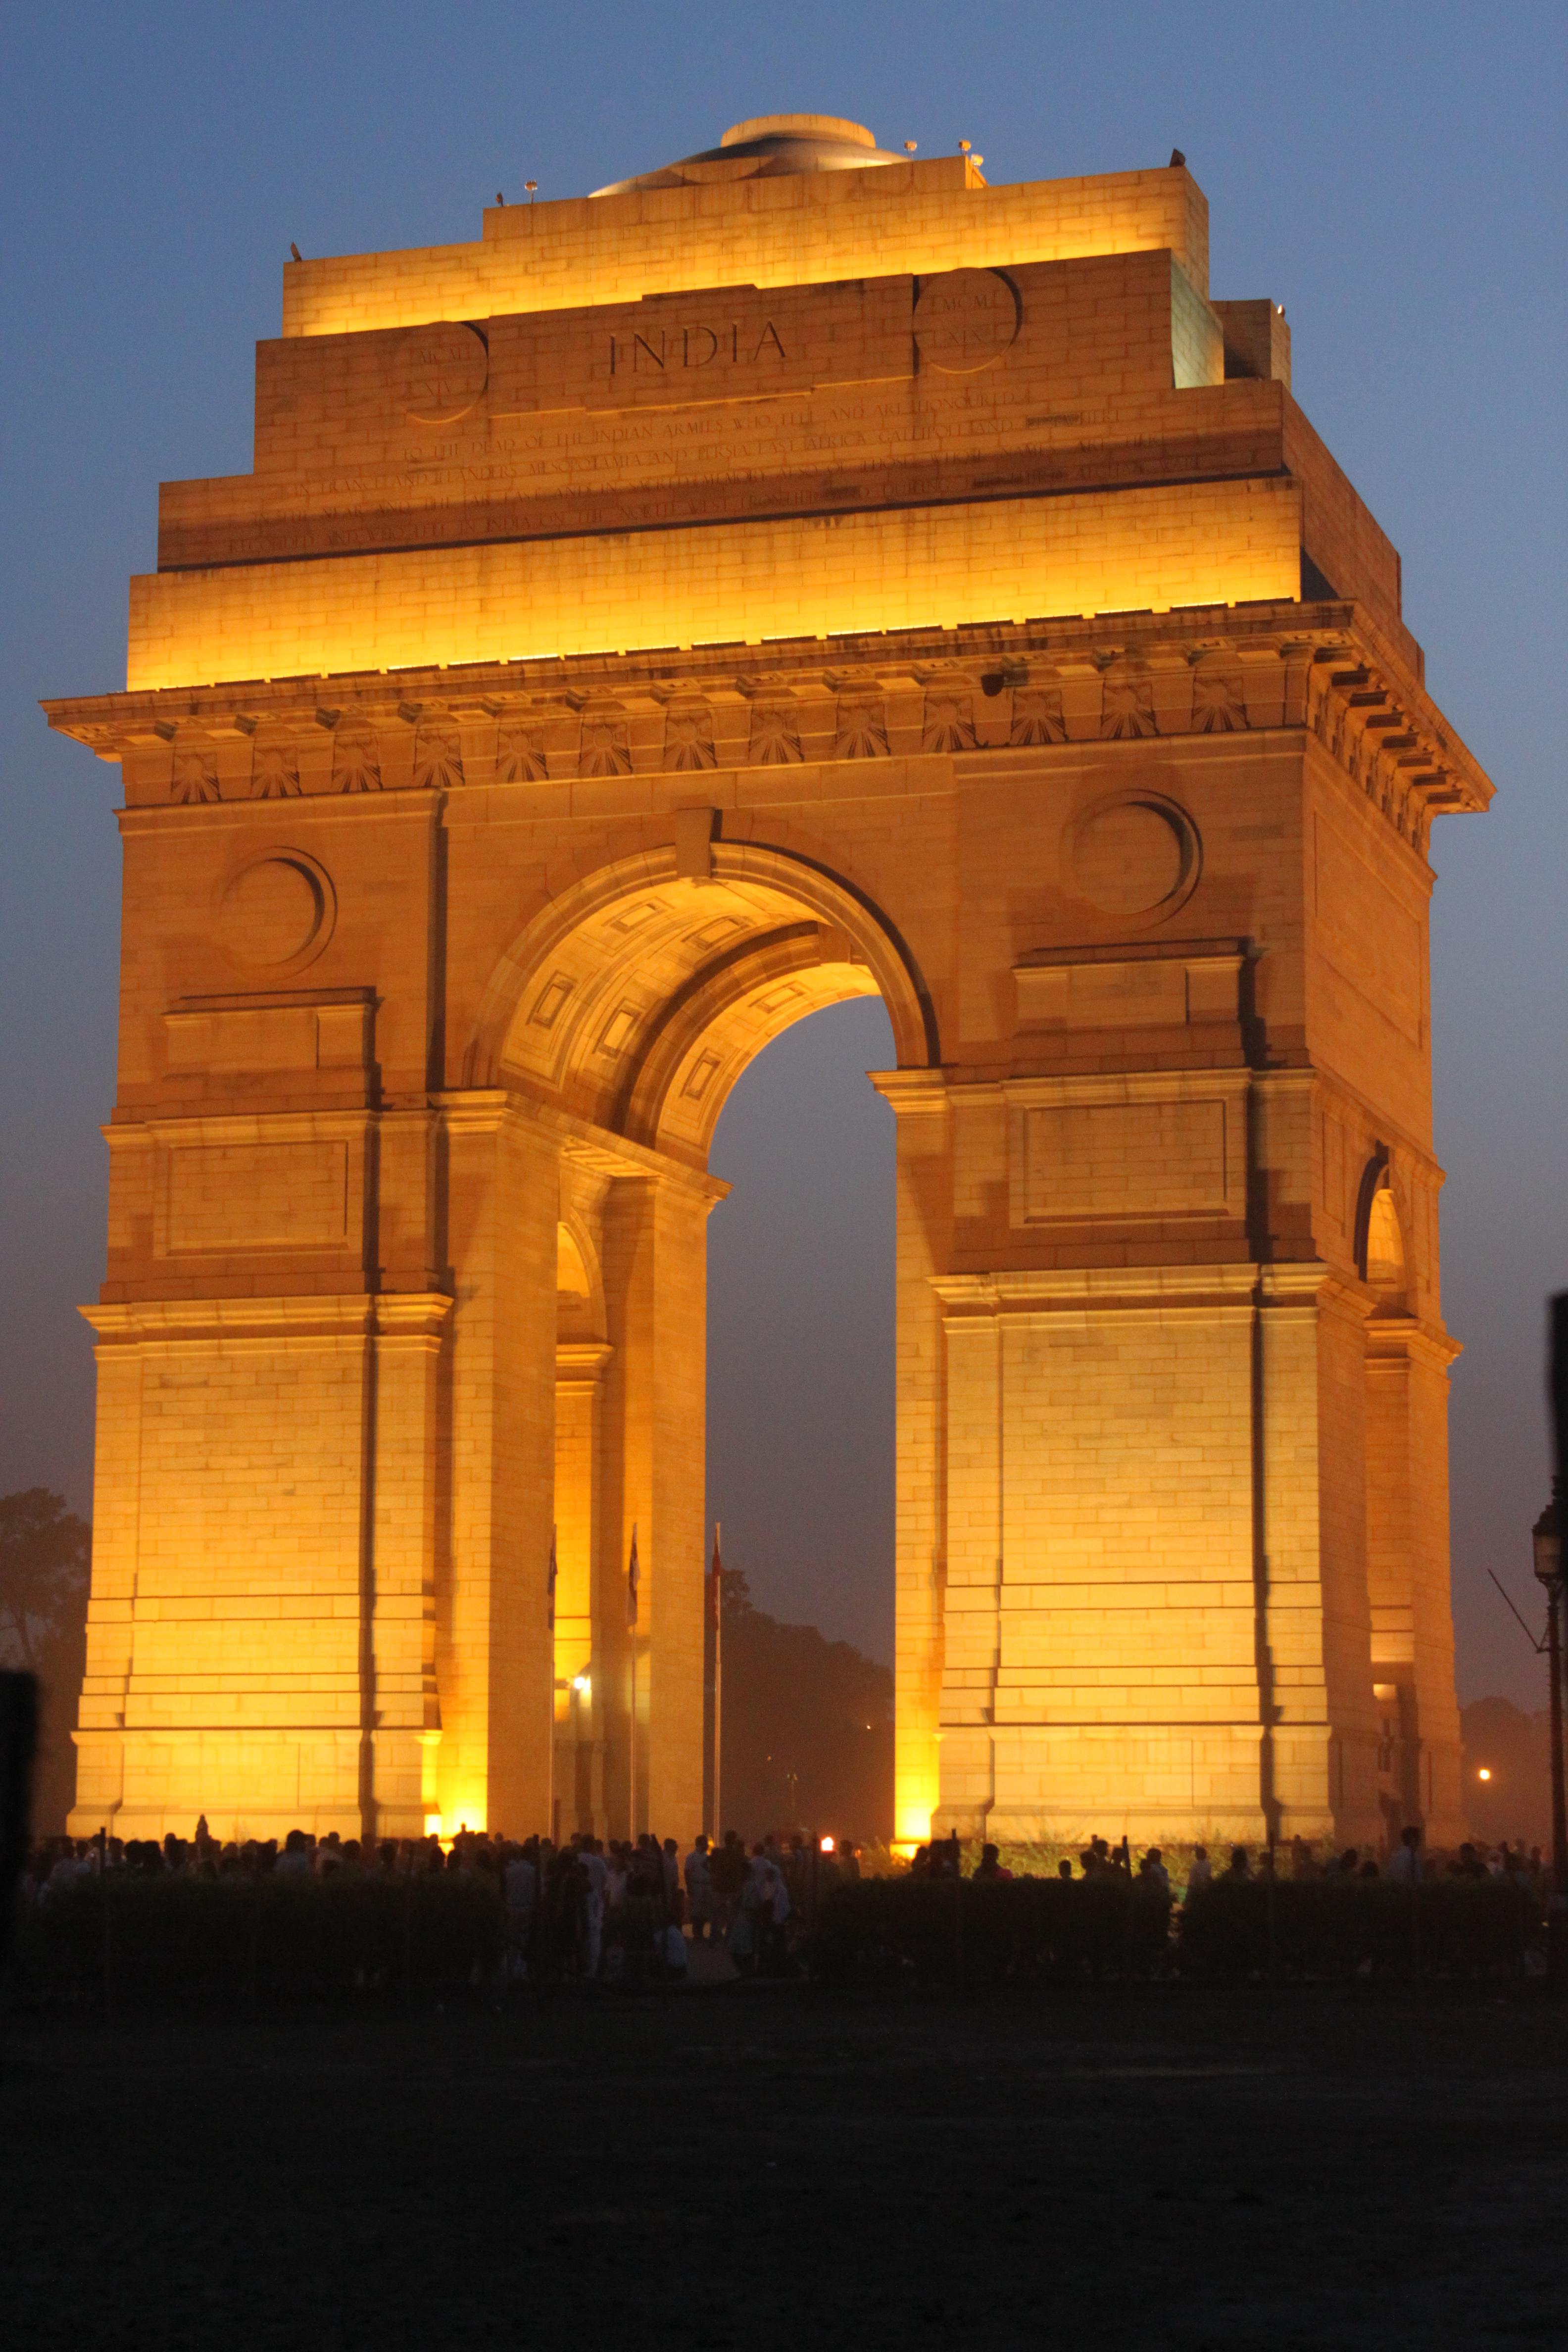 essay on india gate